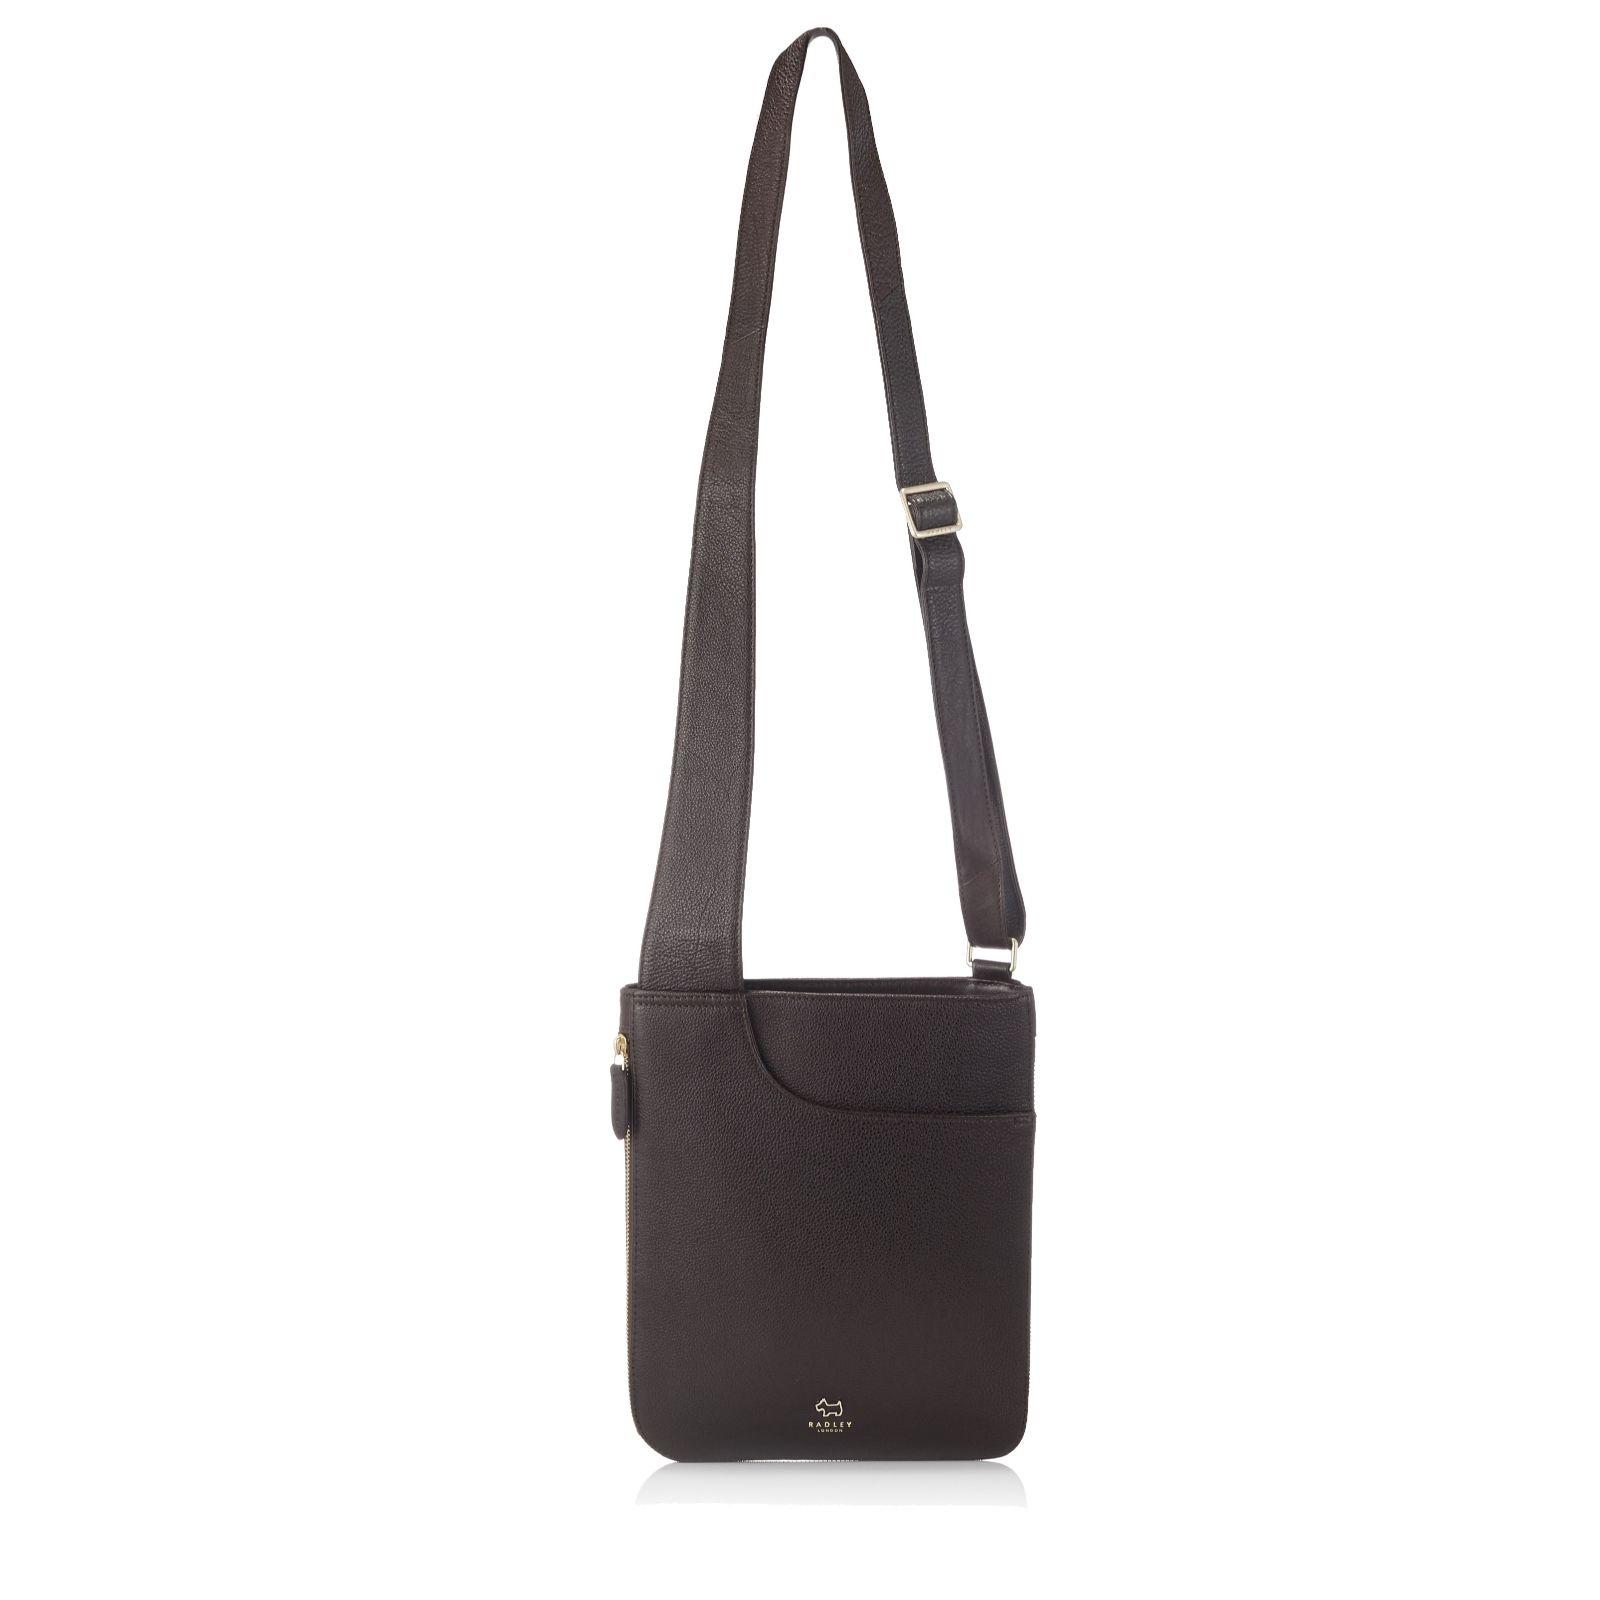 7d4909036f Radley London Pockets Medium Leather Zip Top Crossbody Bag - QVC UK